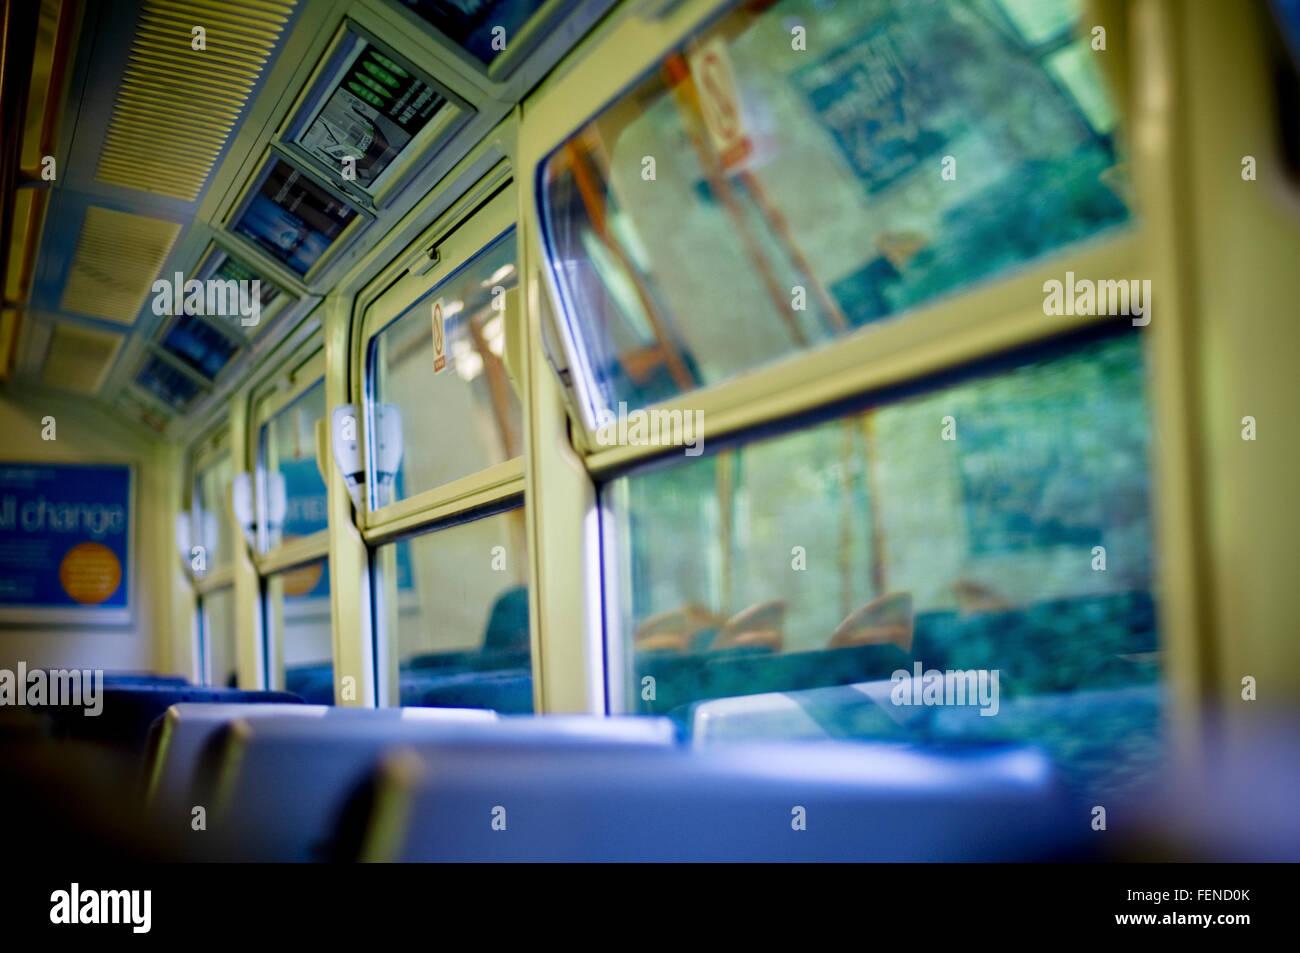 Innenraum des Zuges Stockbild